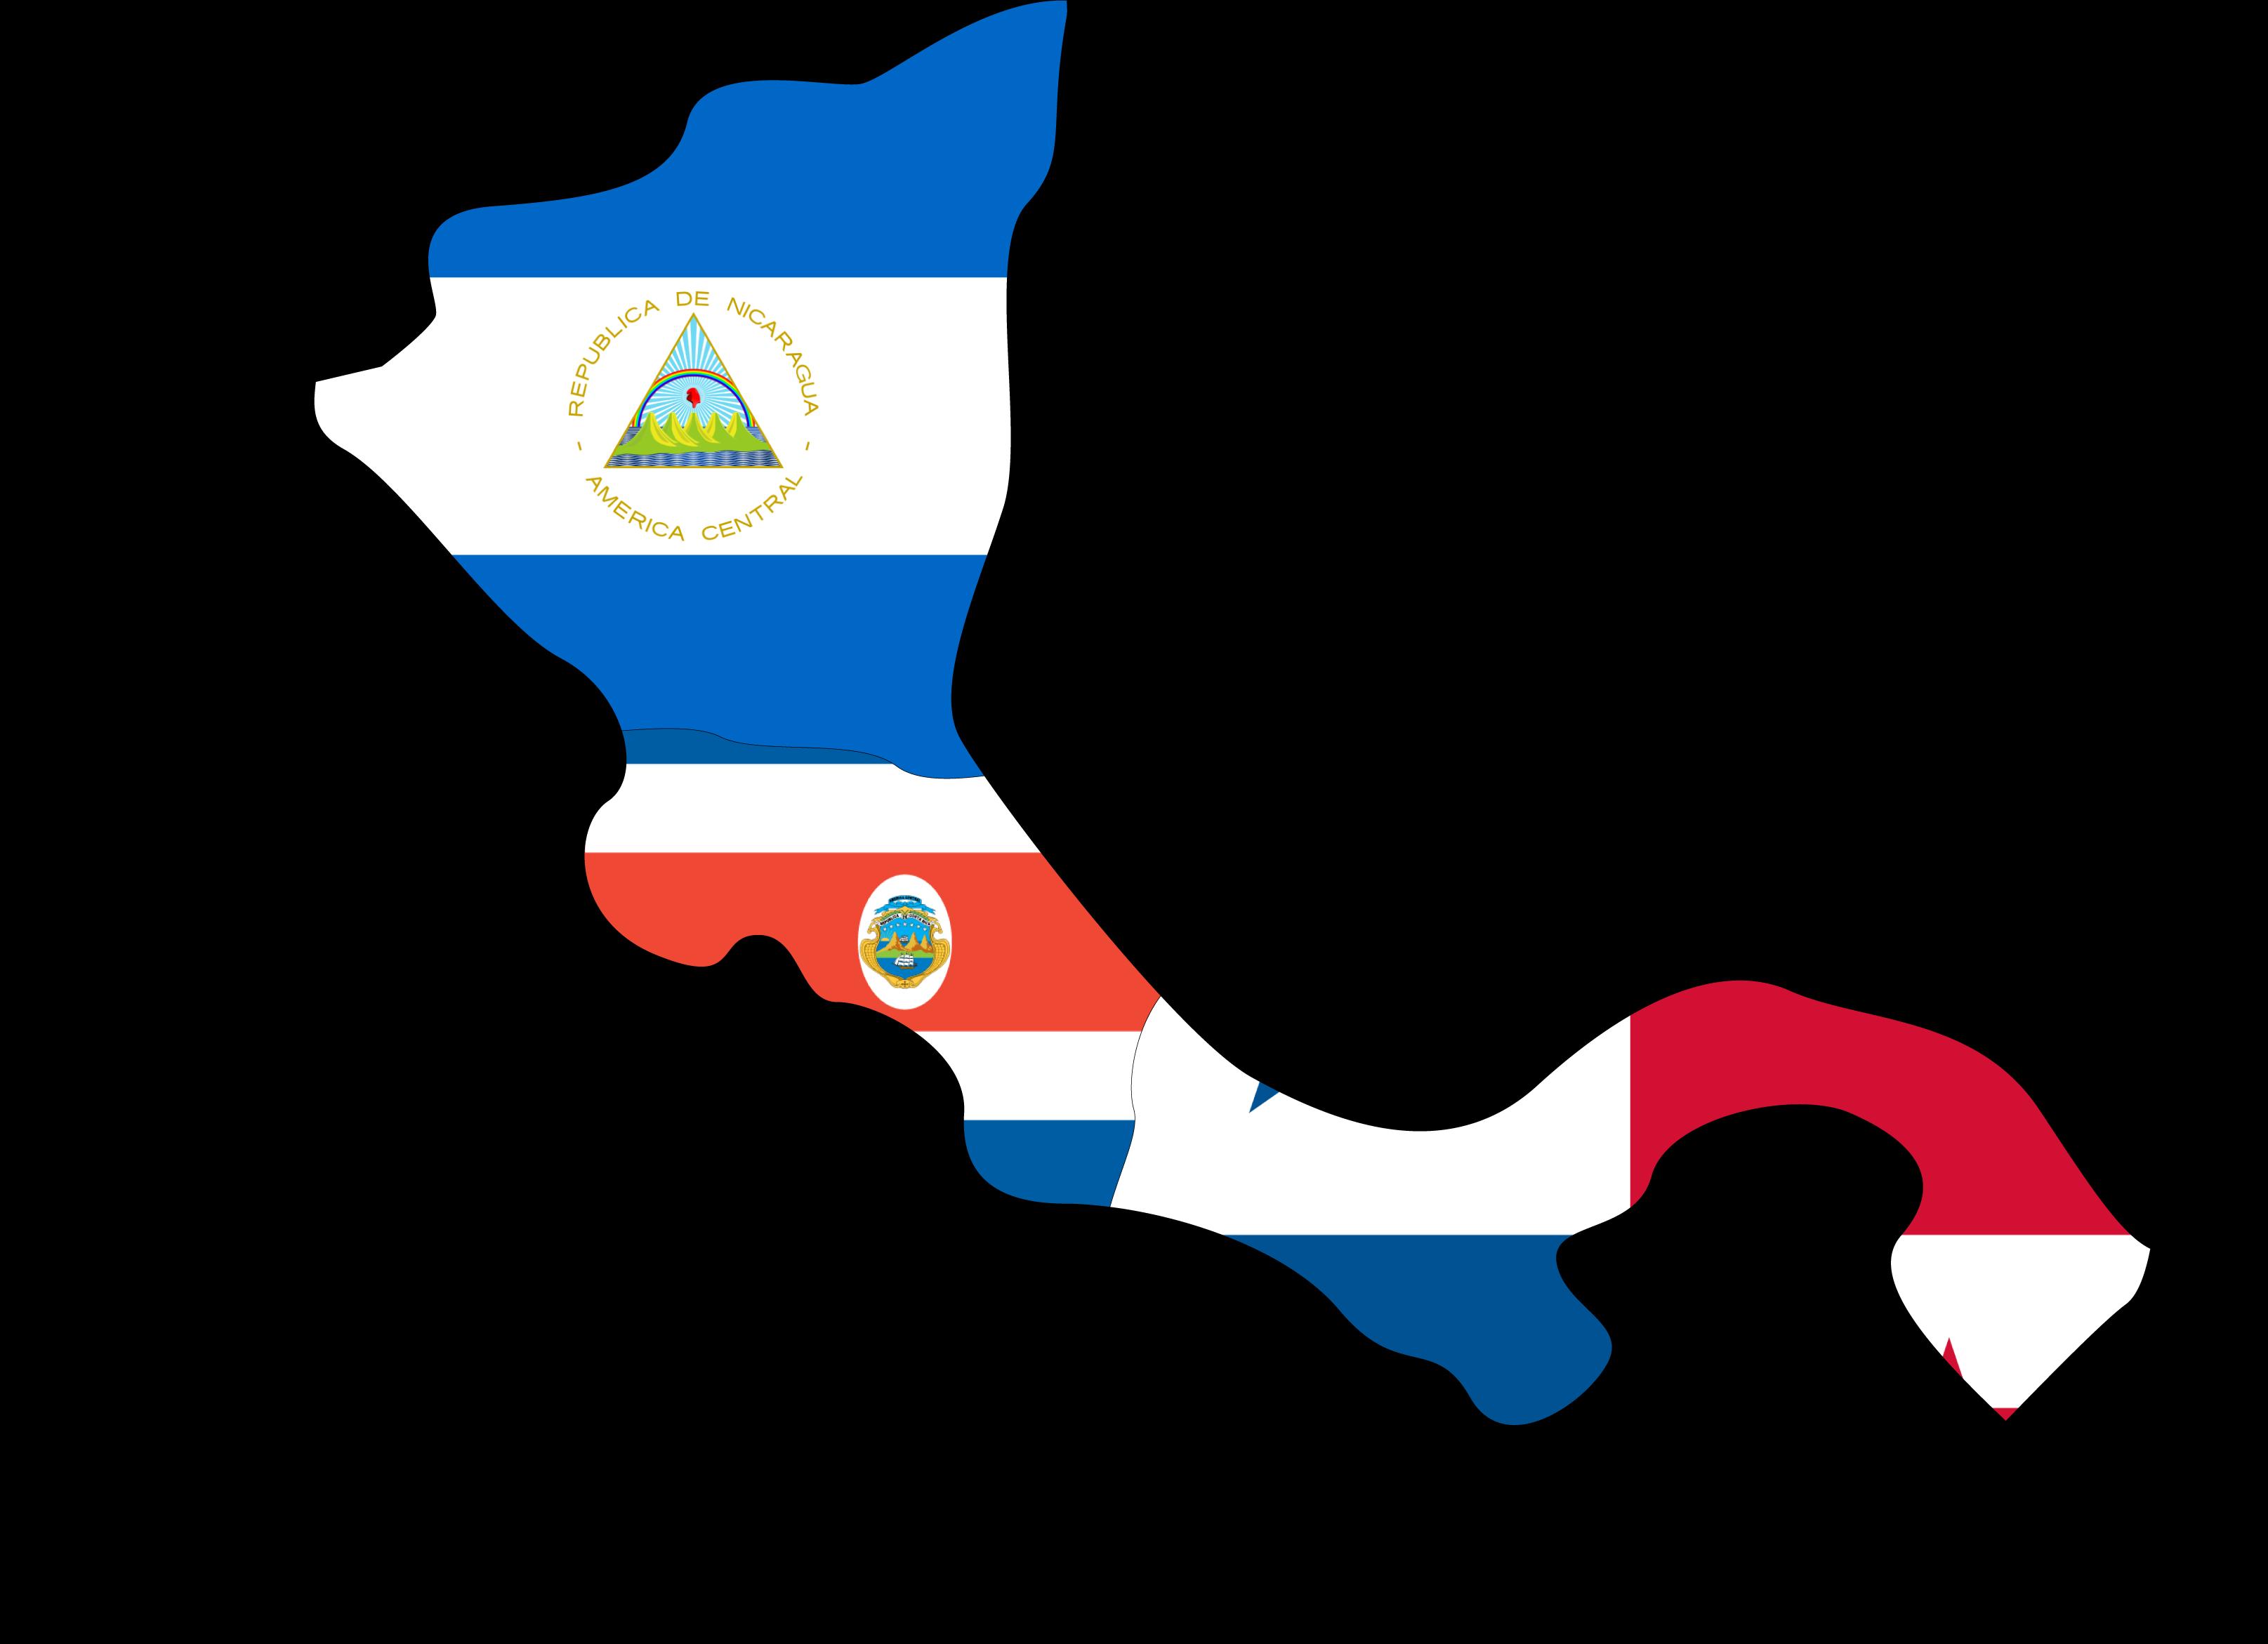 Map of Nicaragua, Costa Rica, and Panama.